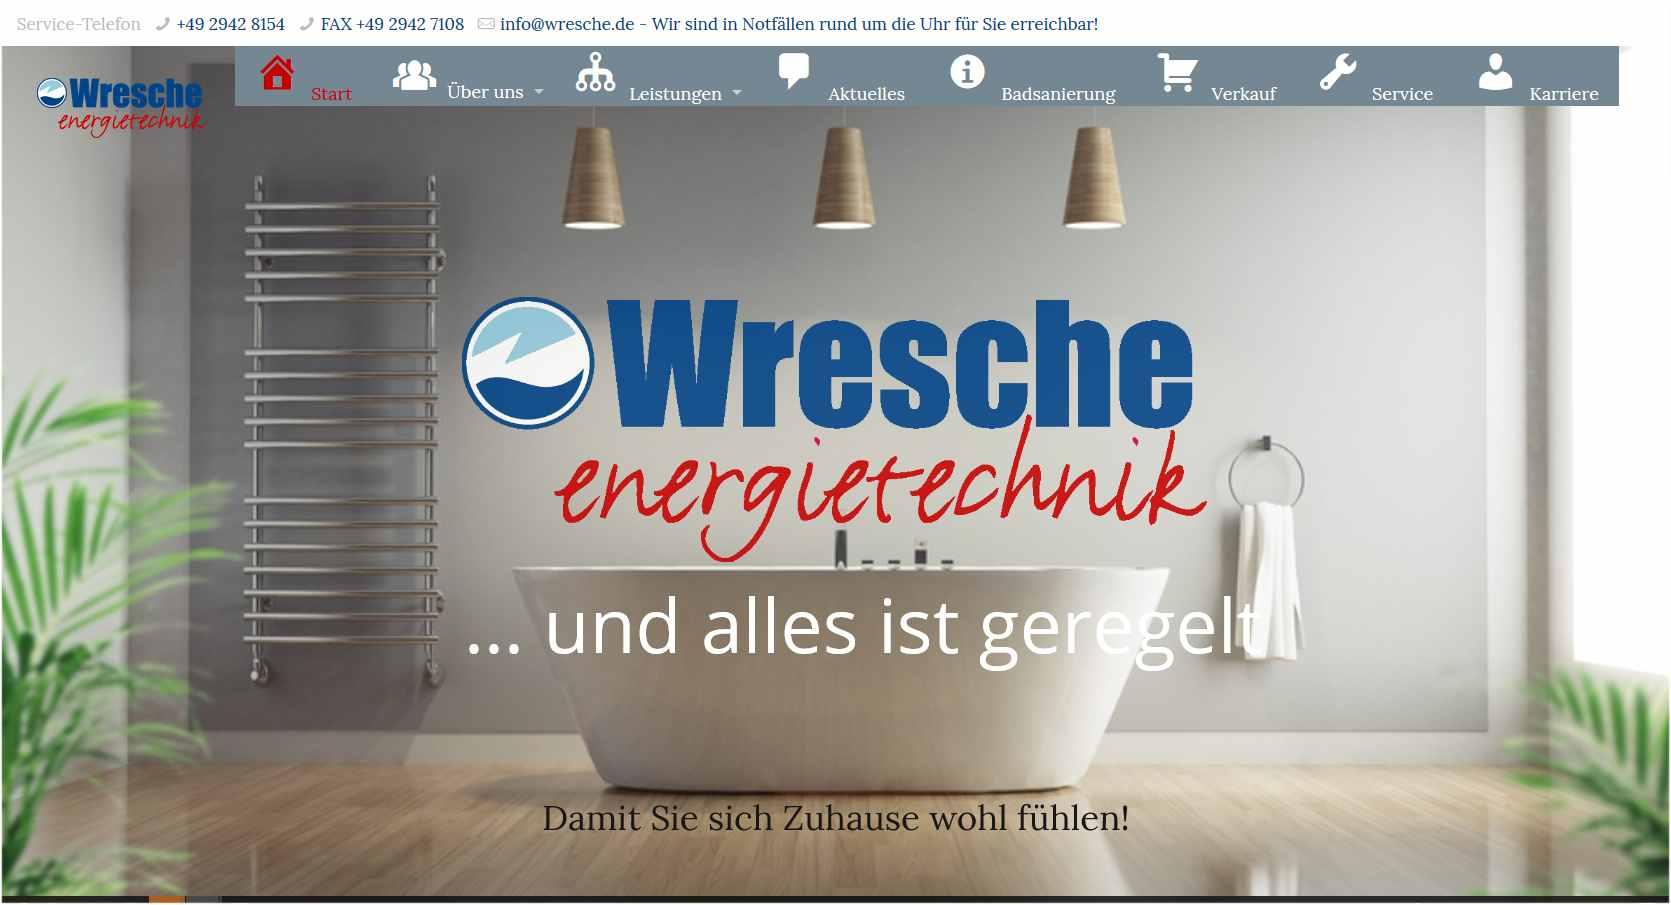 Webseite A24